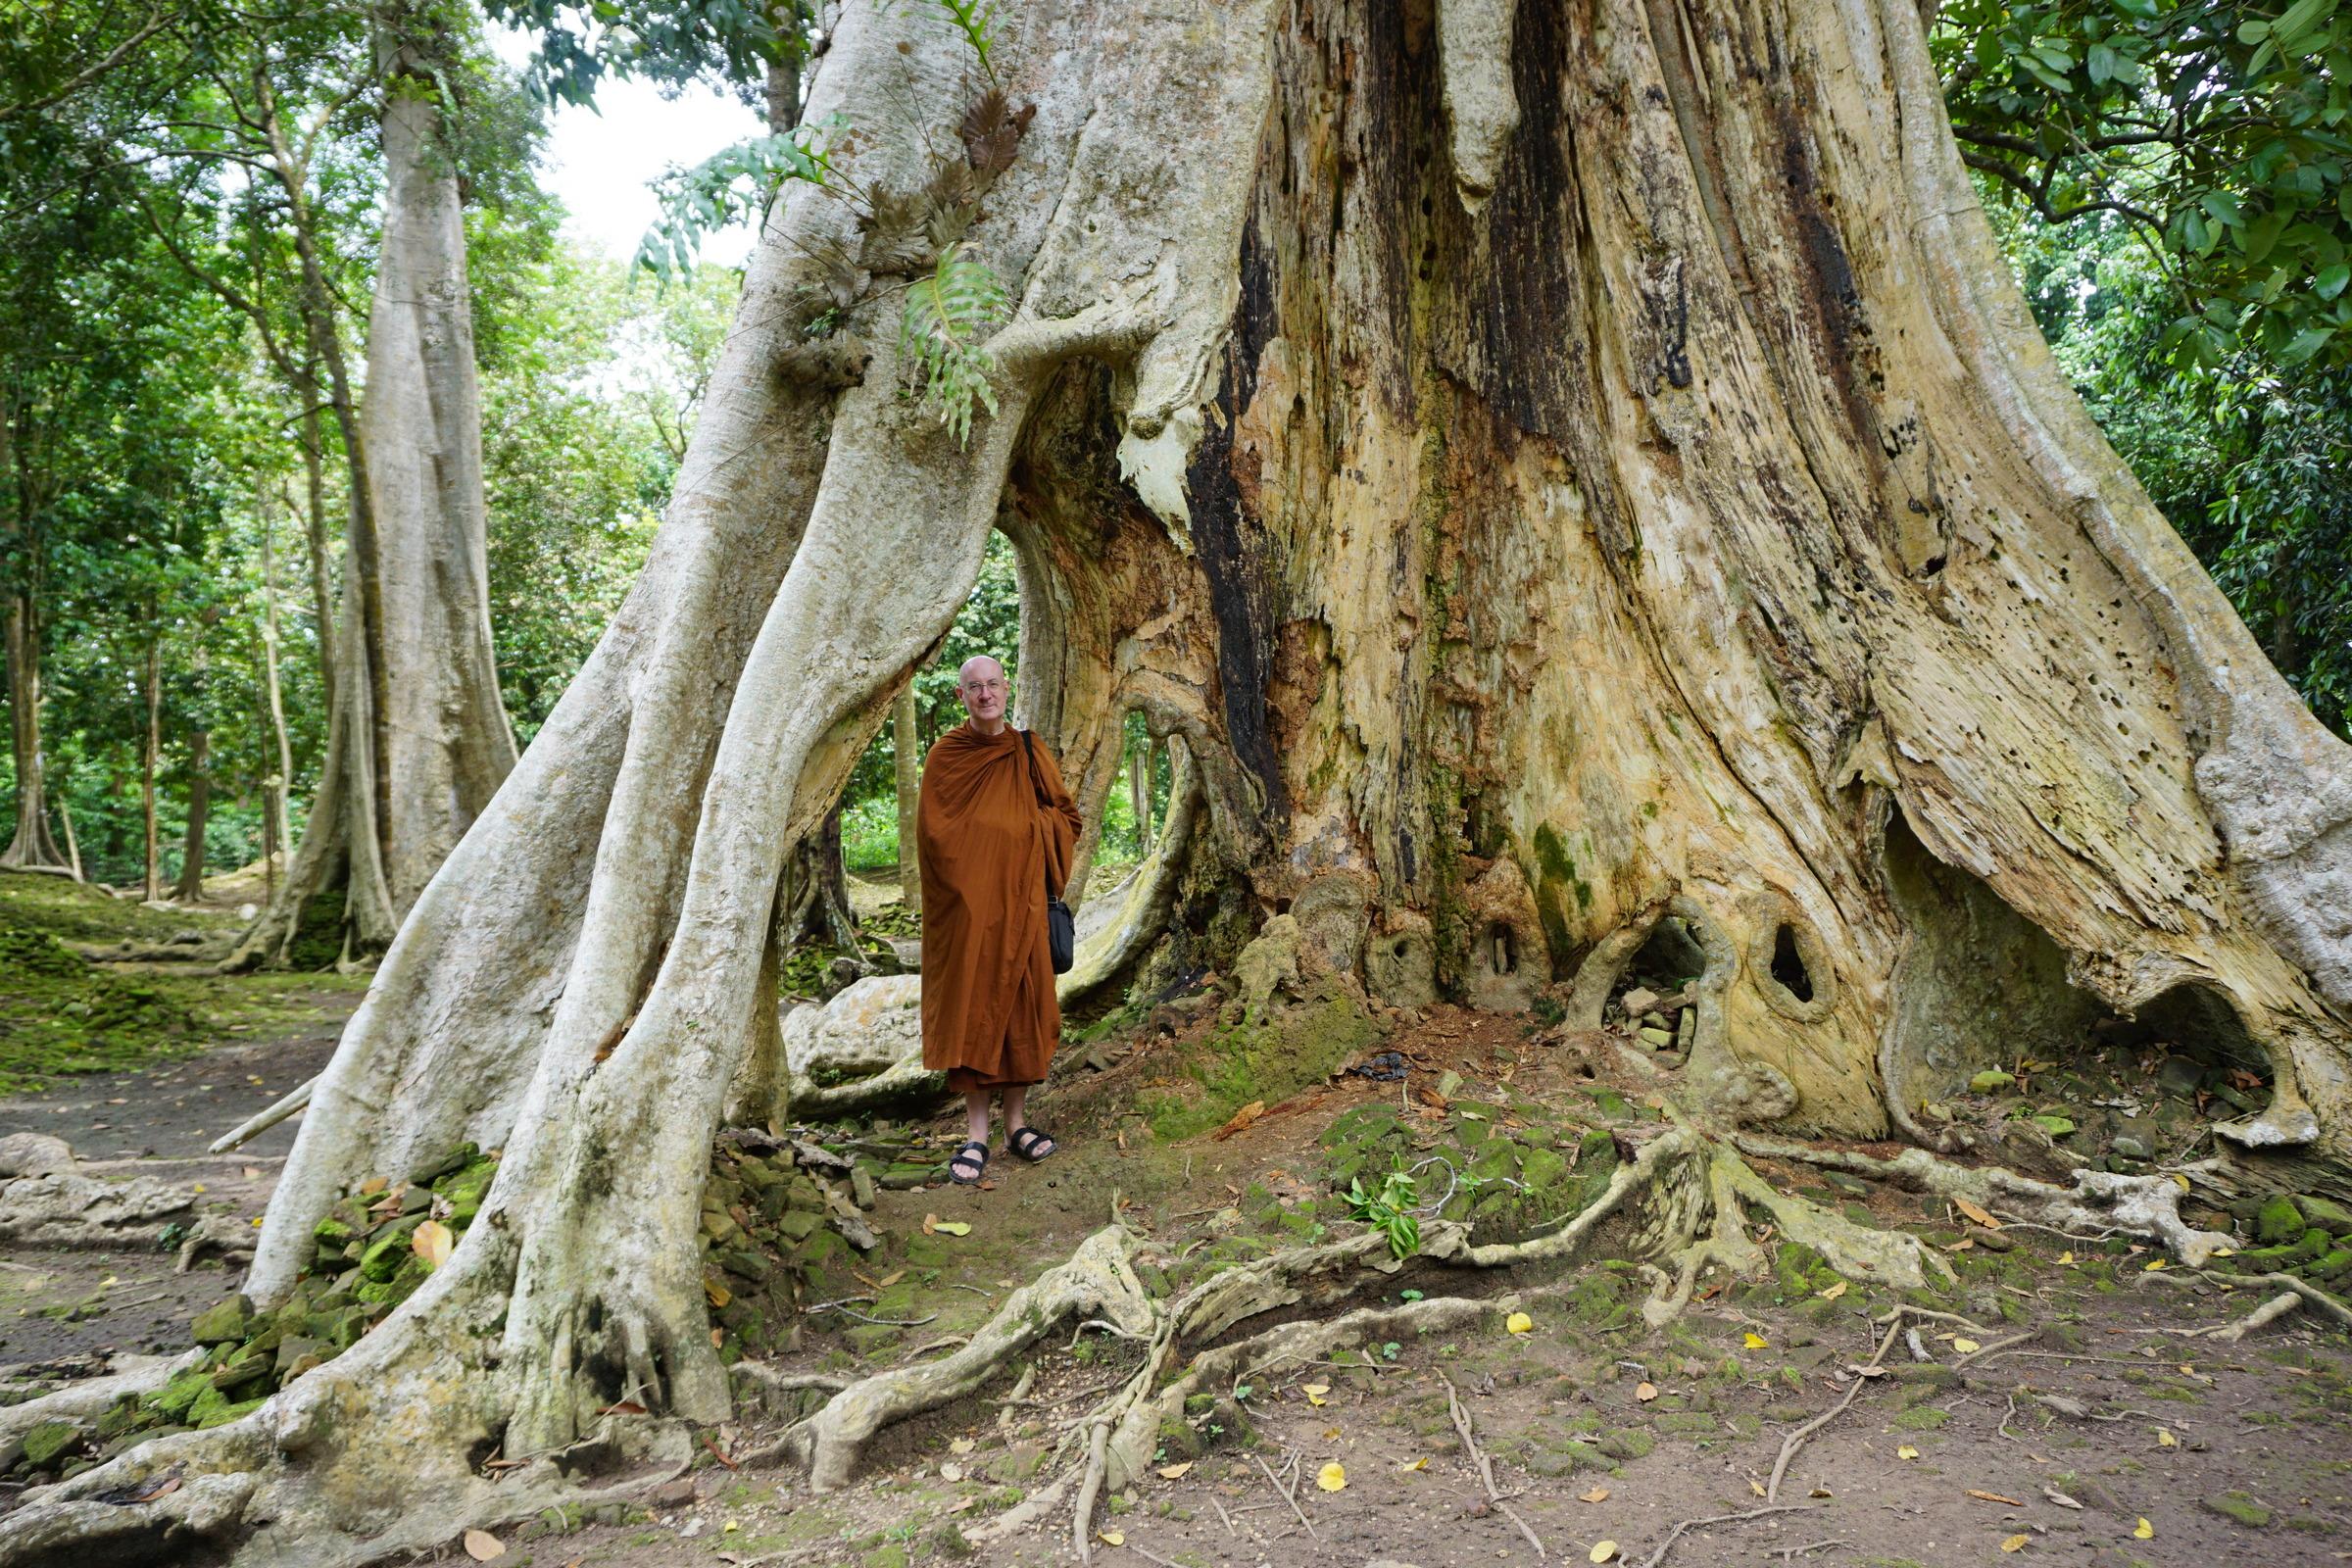 Under a massive Tree at Candi Koto Mahligai